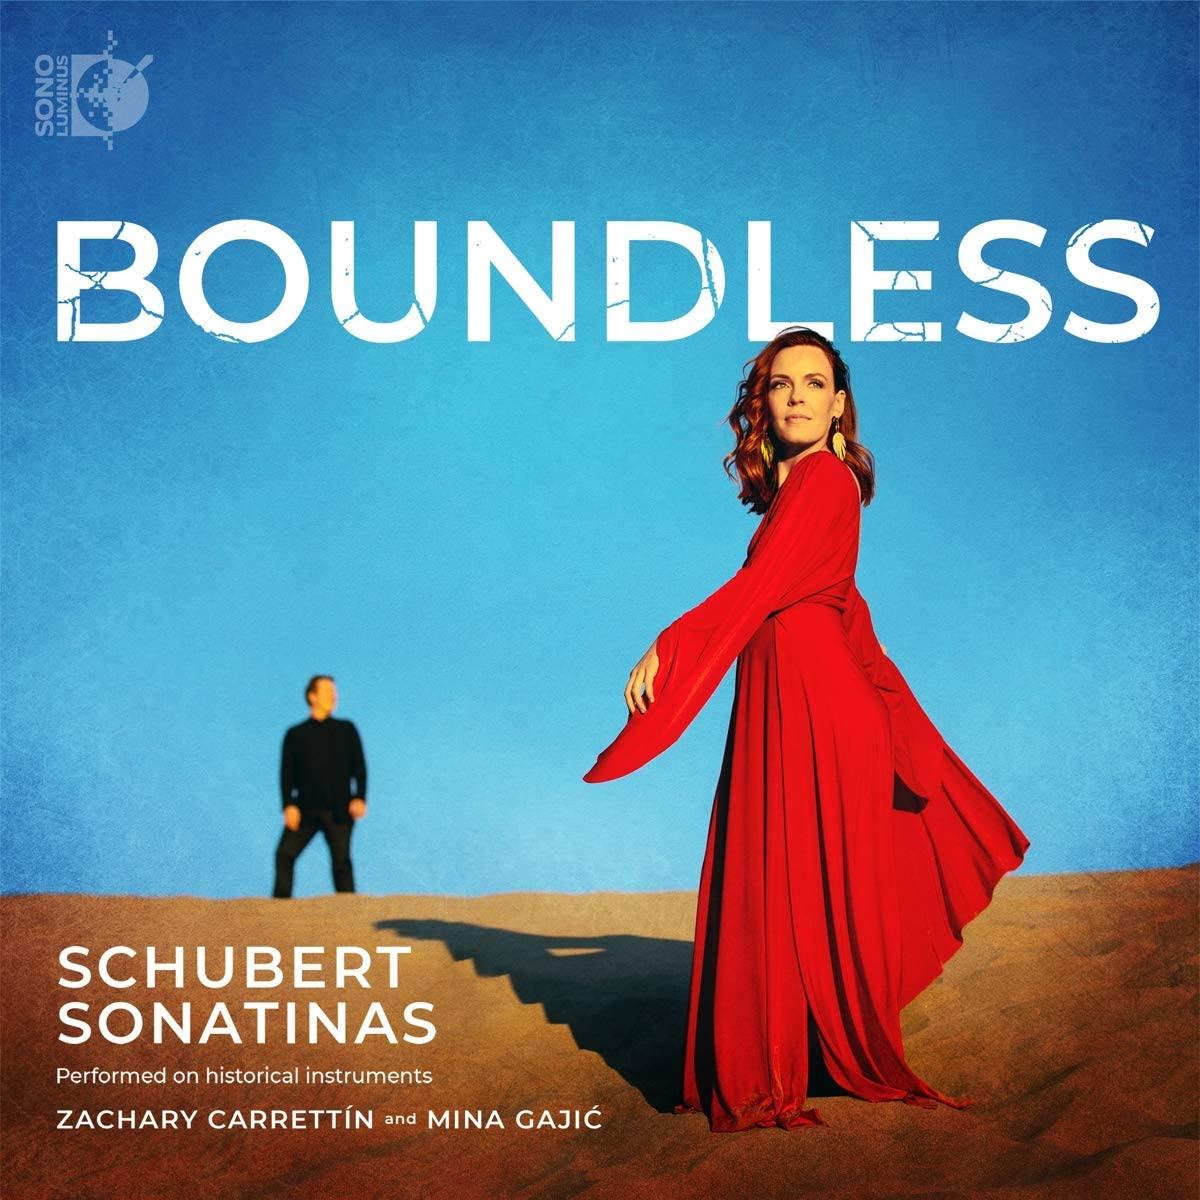 Review of SCHUBERT Sonatinas 'Boundless'